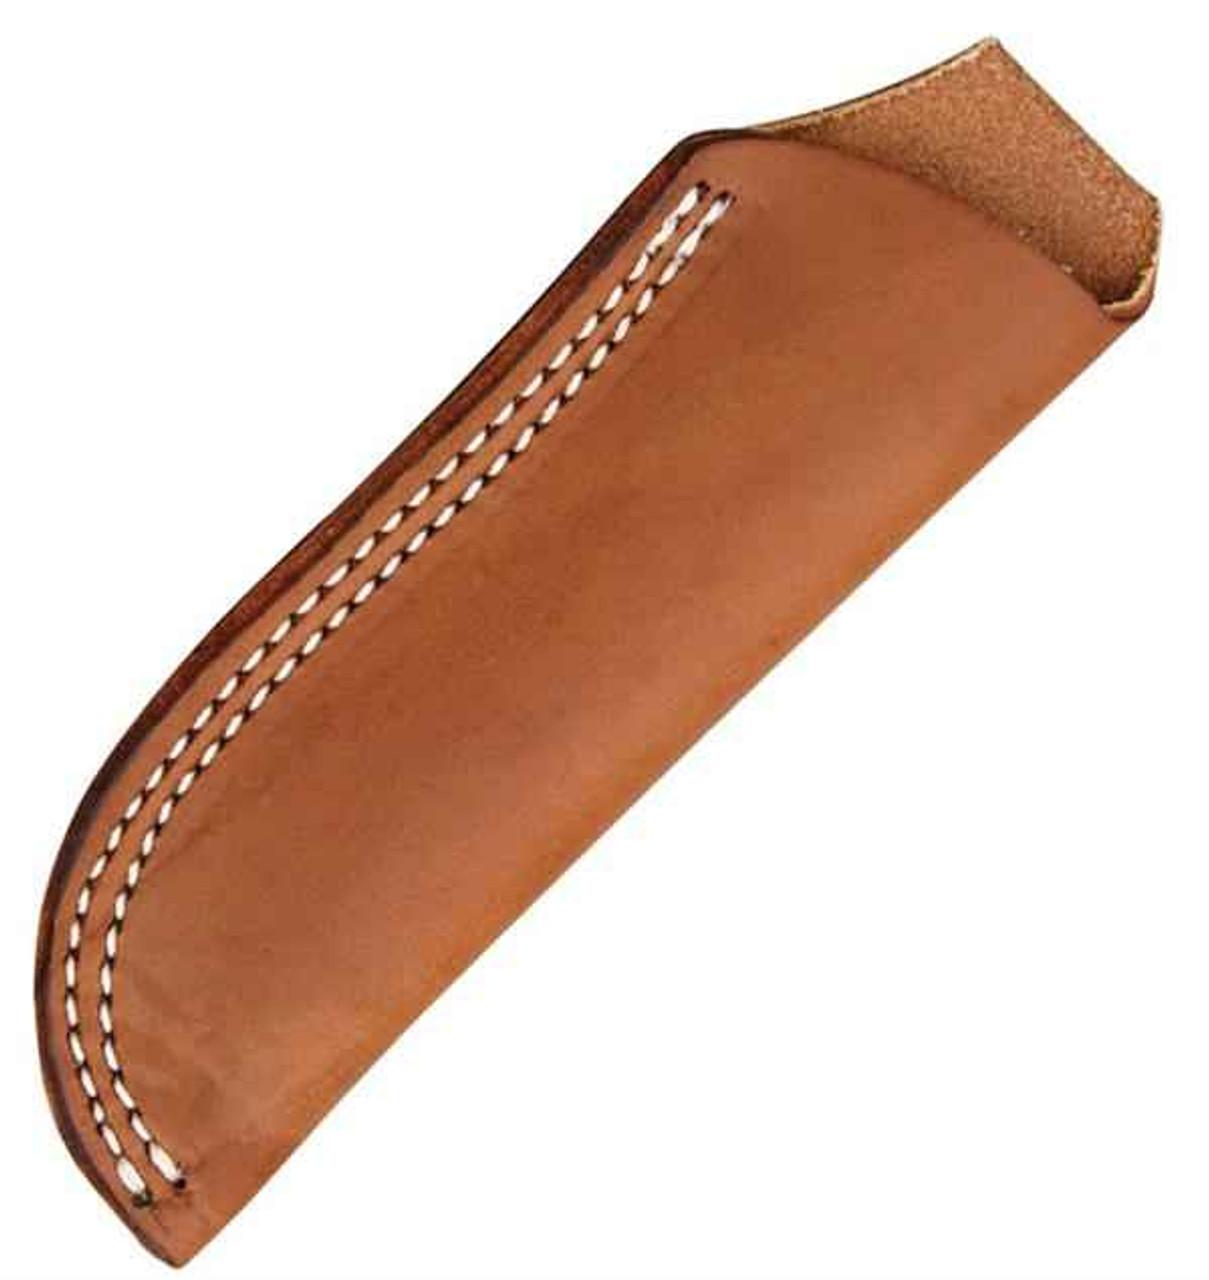 Sharpshooter Medium Sheath, fits ESEE Knives